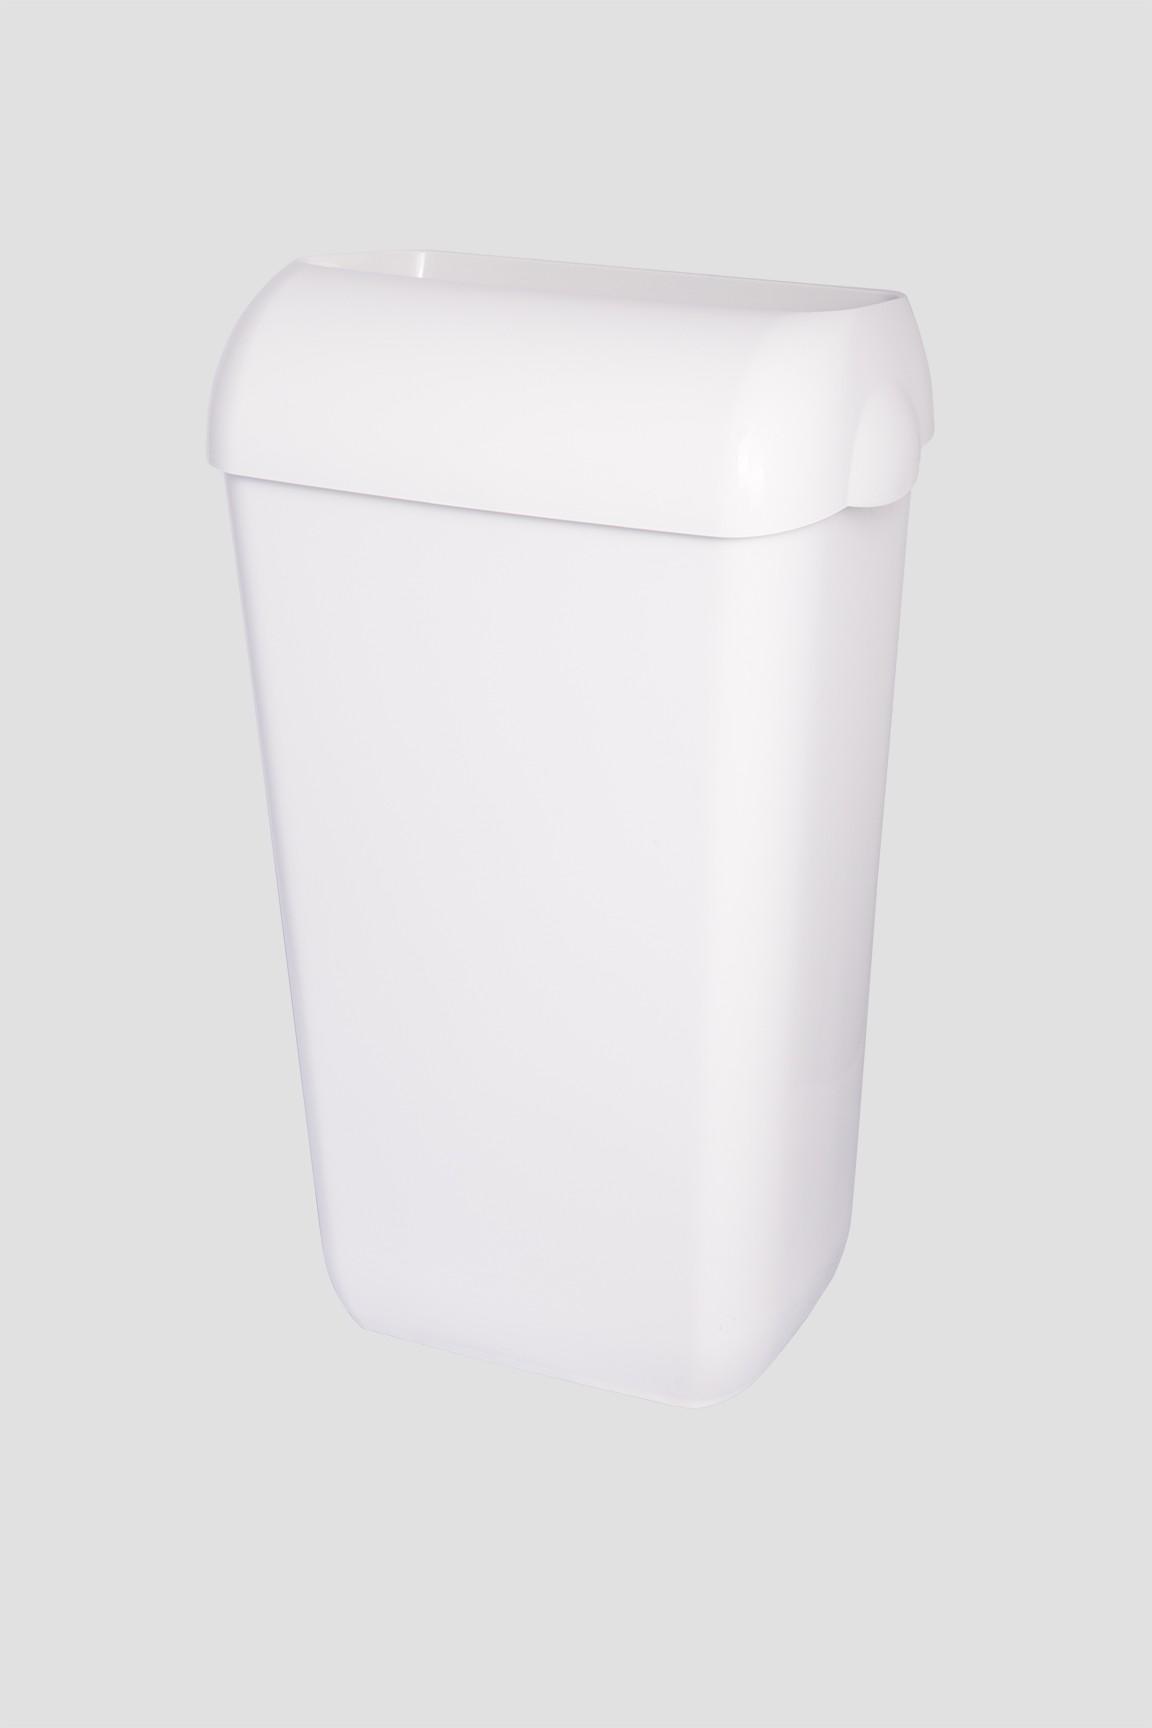 BCL®-Abfallbehälter